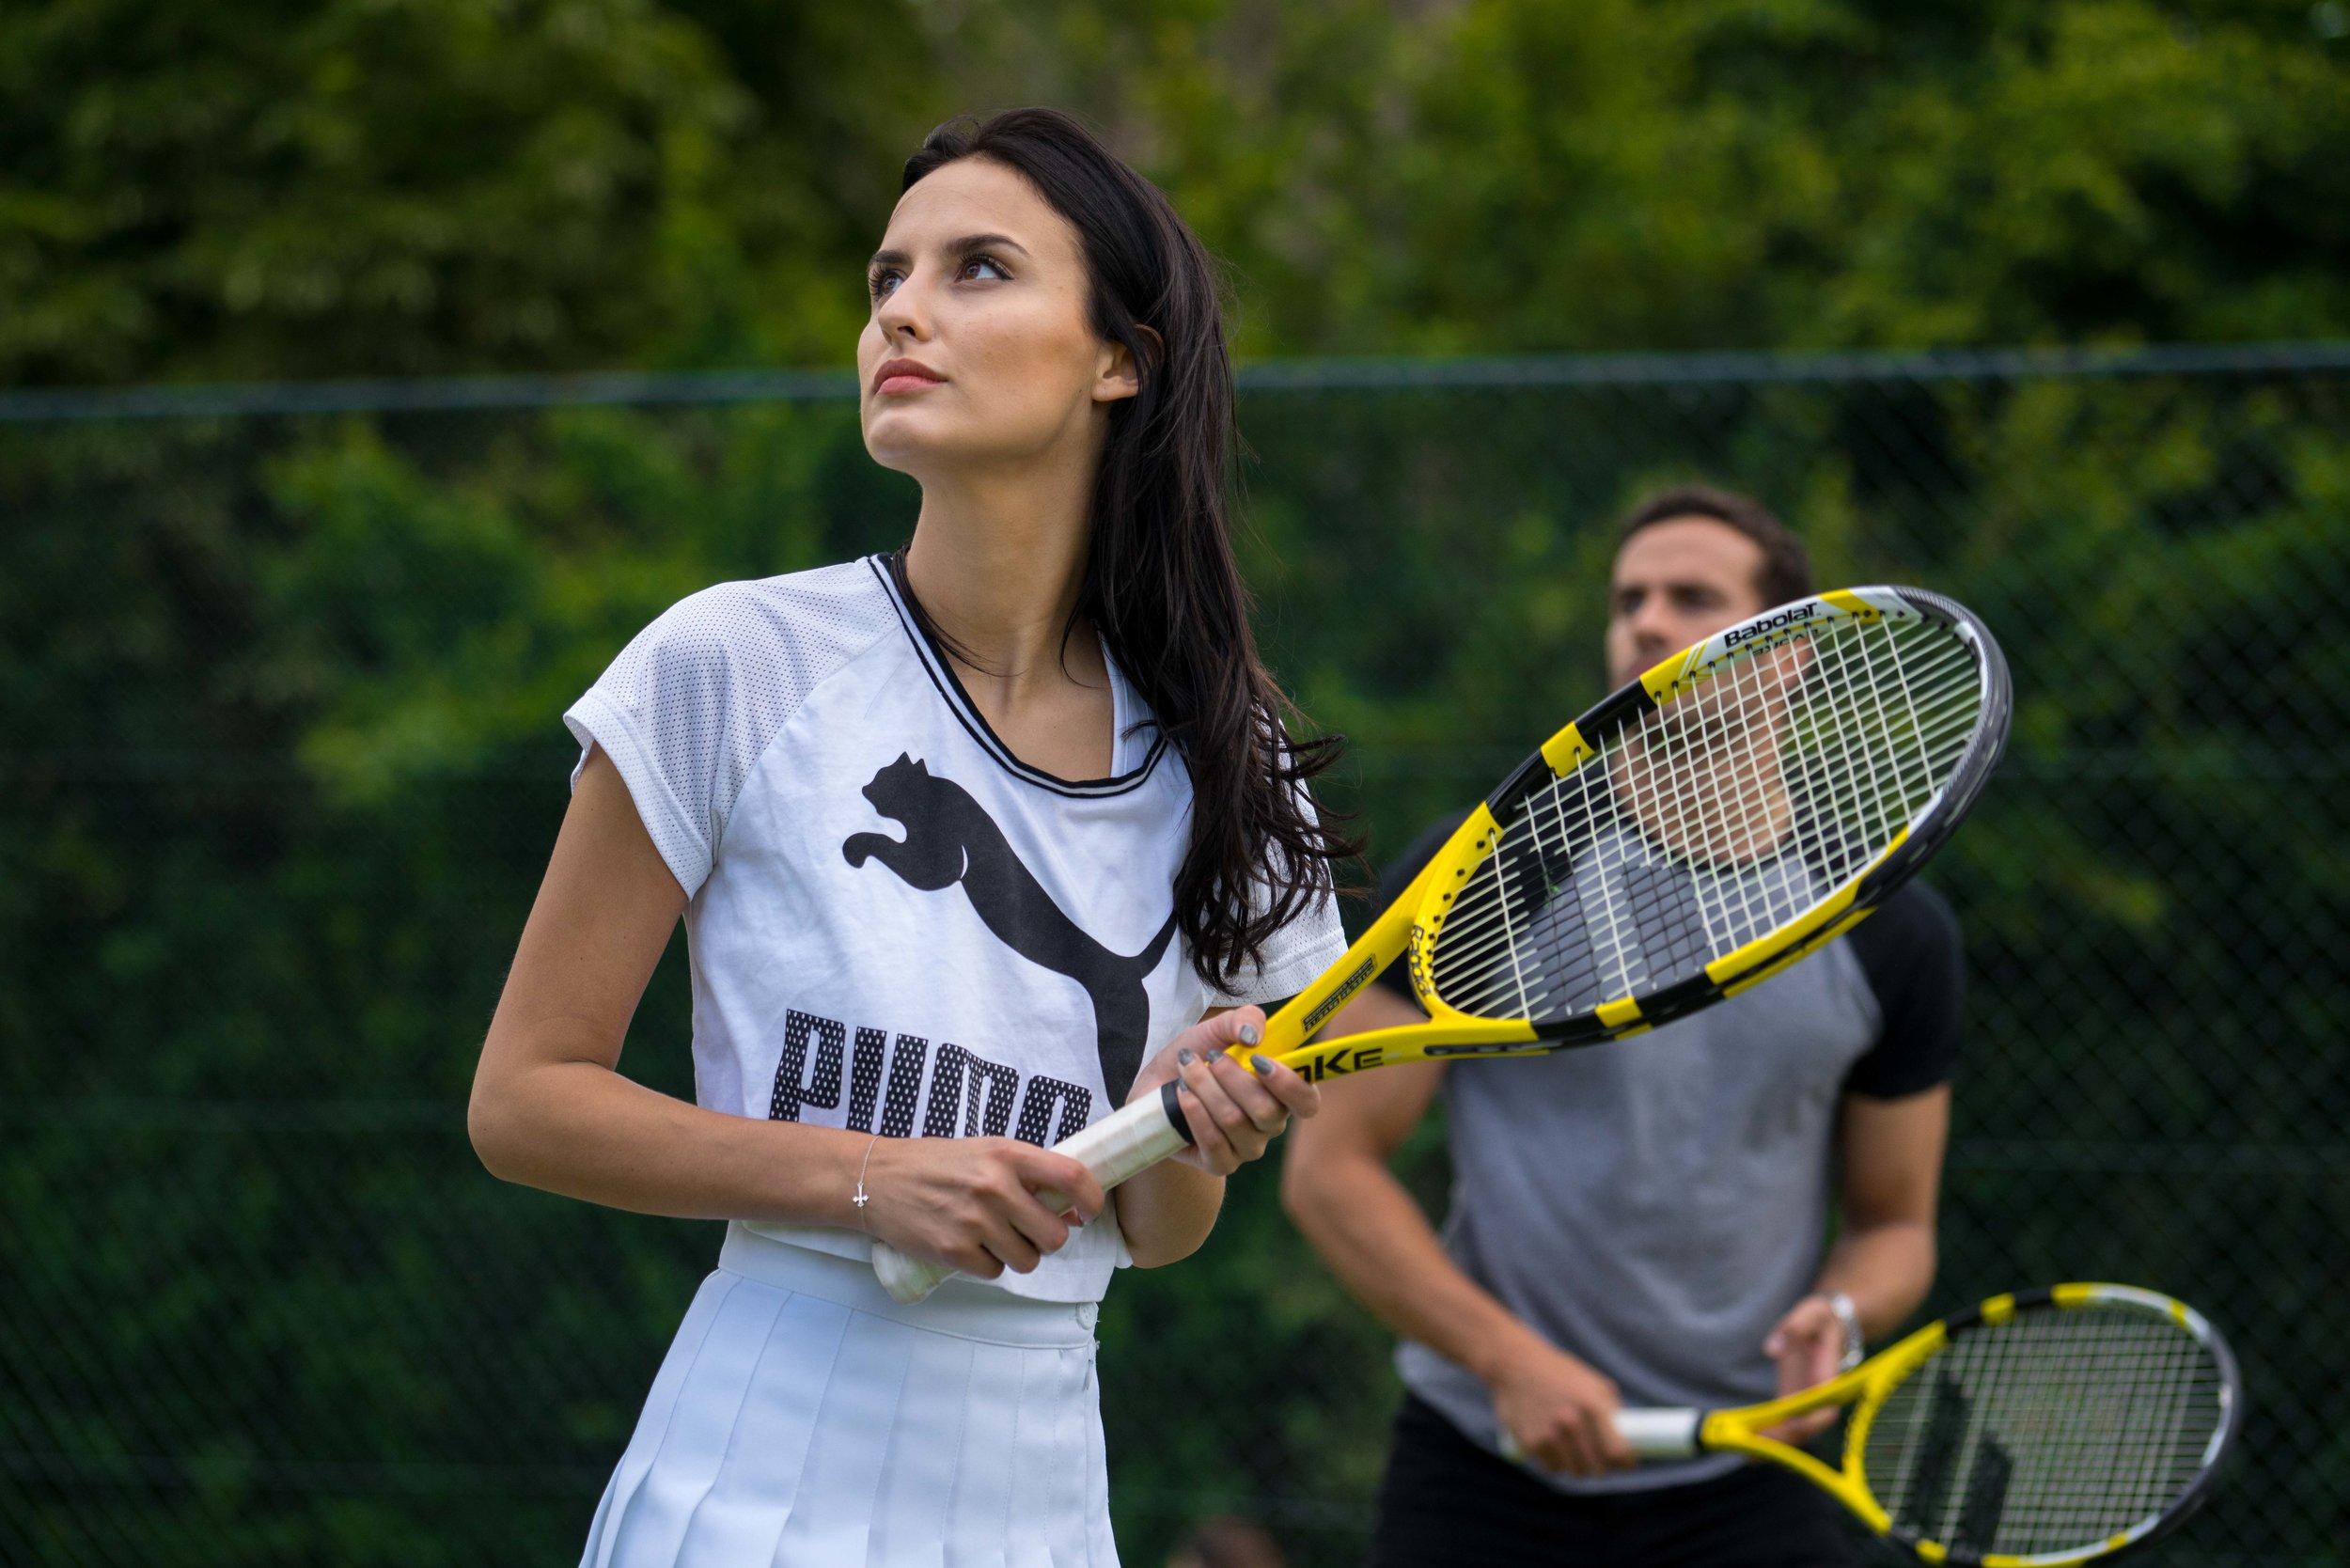 Lucy Watson x Puma Tennis - Lucy Watson tries tennis during The Championships, Wimbledon.